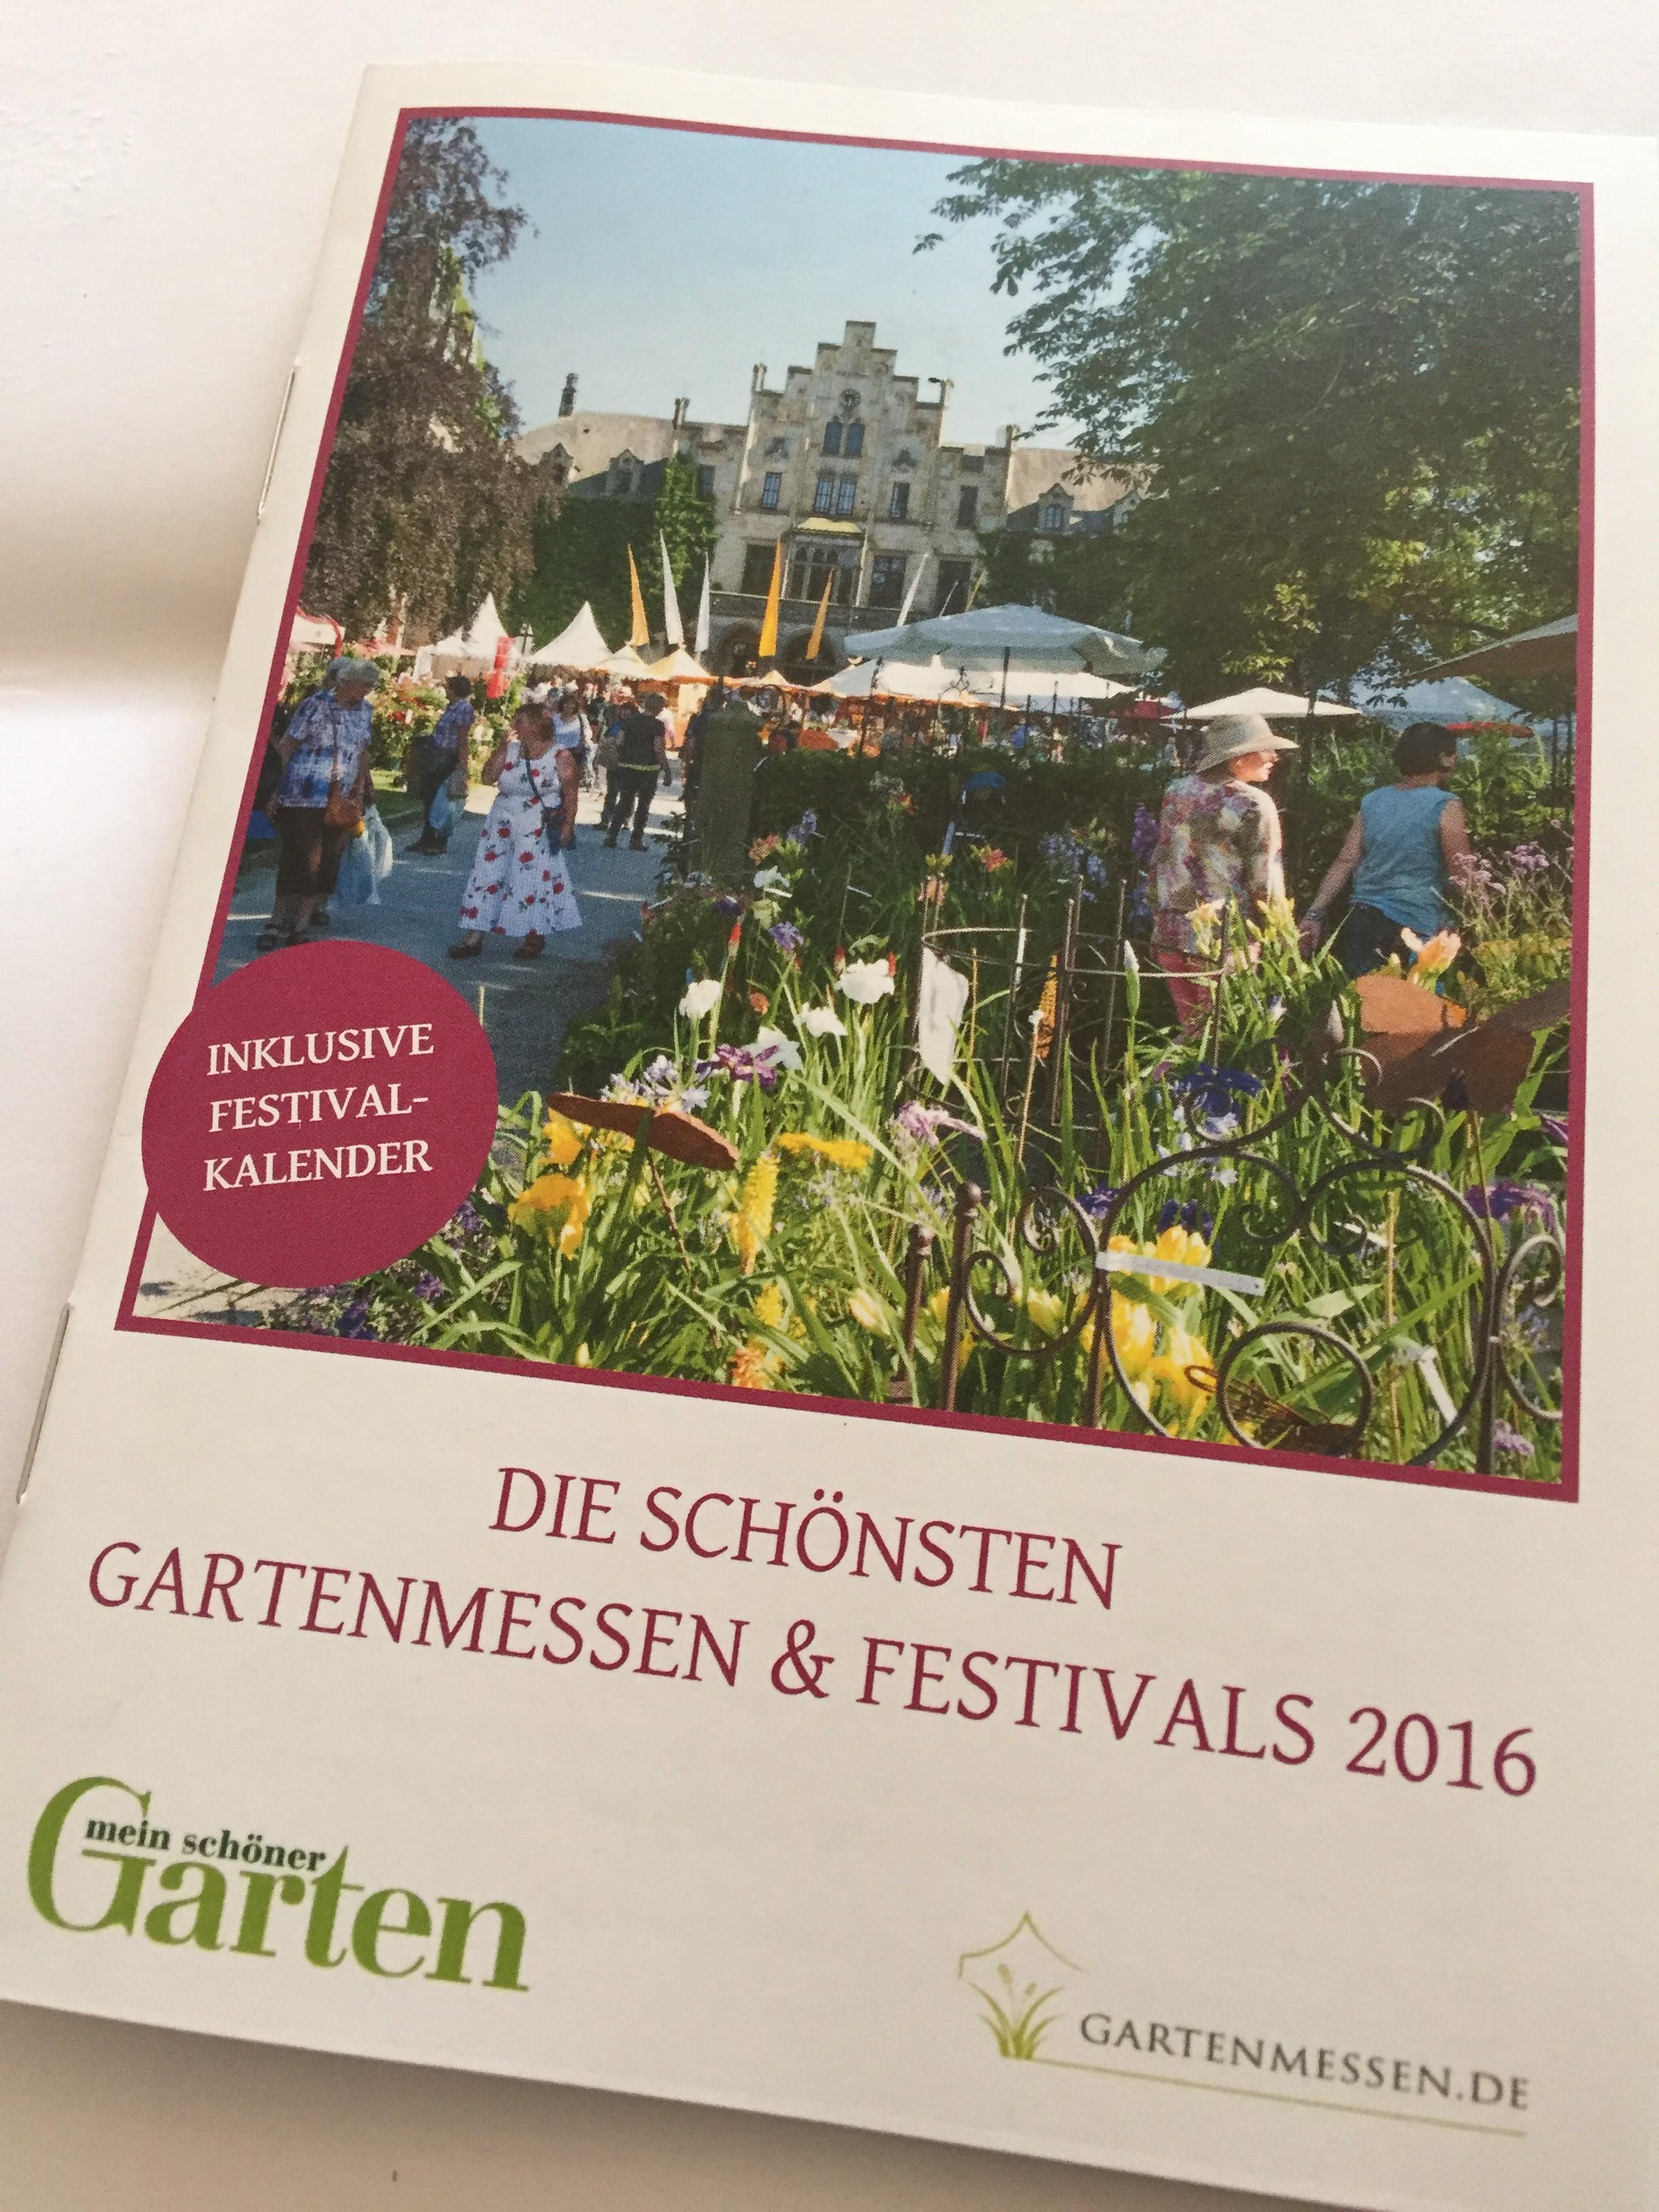 Bild_Gartenfestival Guide 2016 (002)